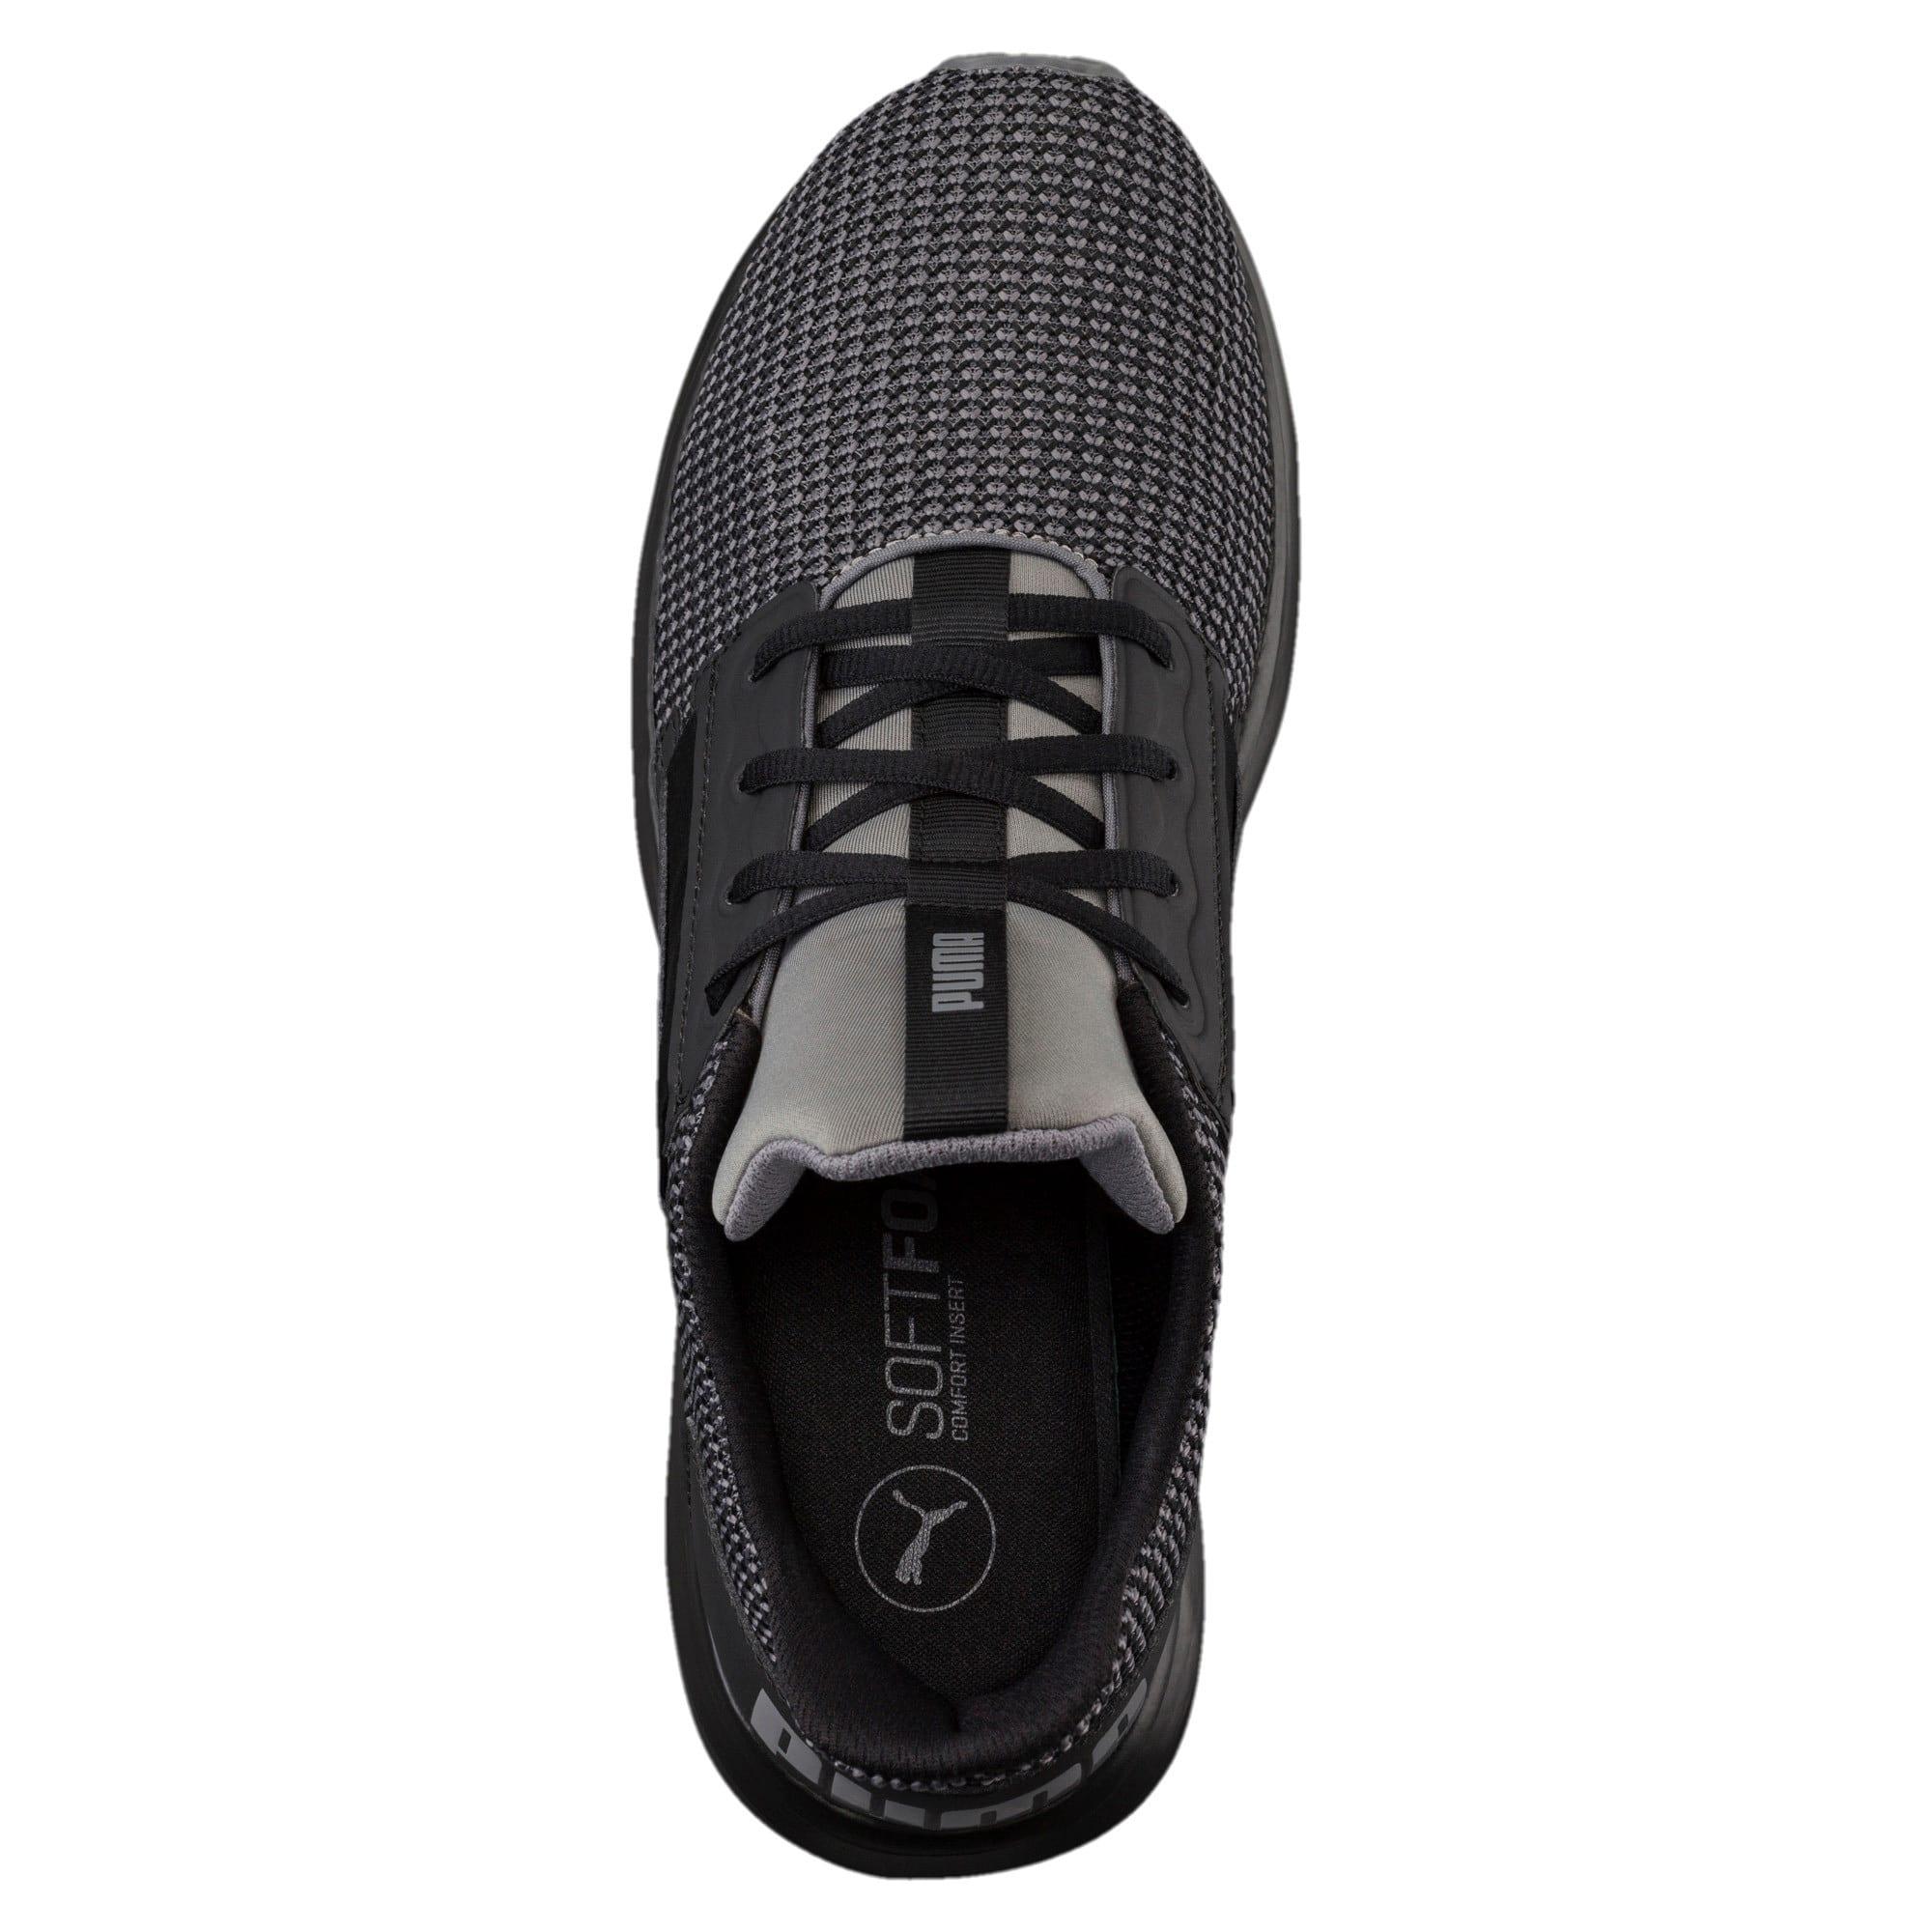 Thumbnail 5 of Enzo Street Knit Men's Running Shoes, QUIET SHADE-Puma Black, medium-IND